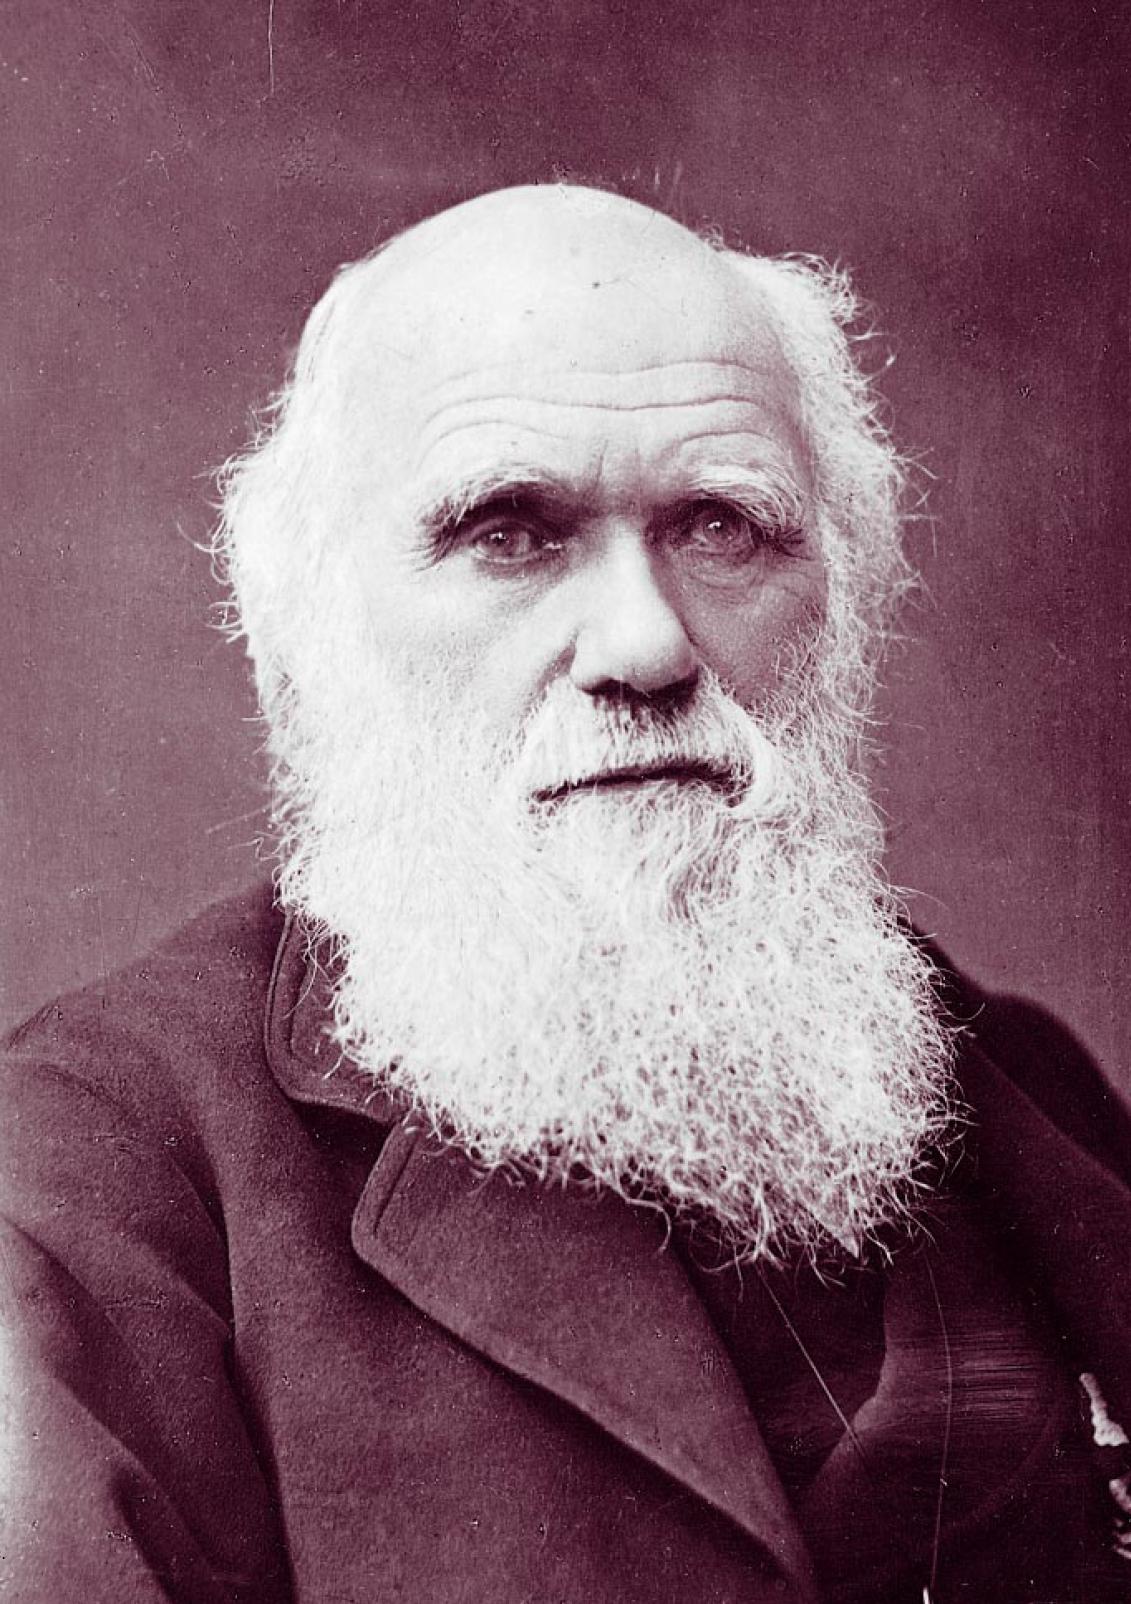 Charles_Darwin_photograph_by_Herbert_Ros